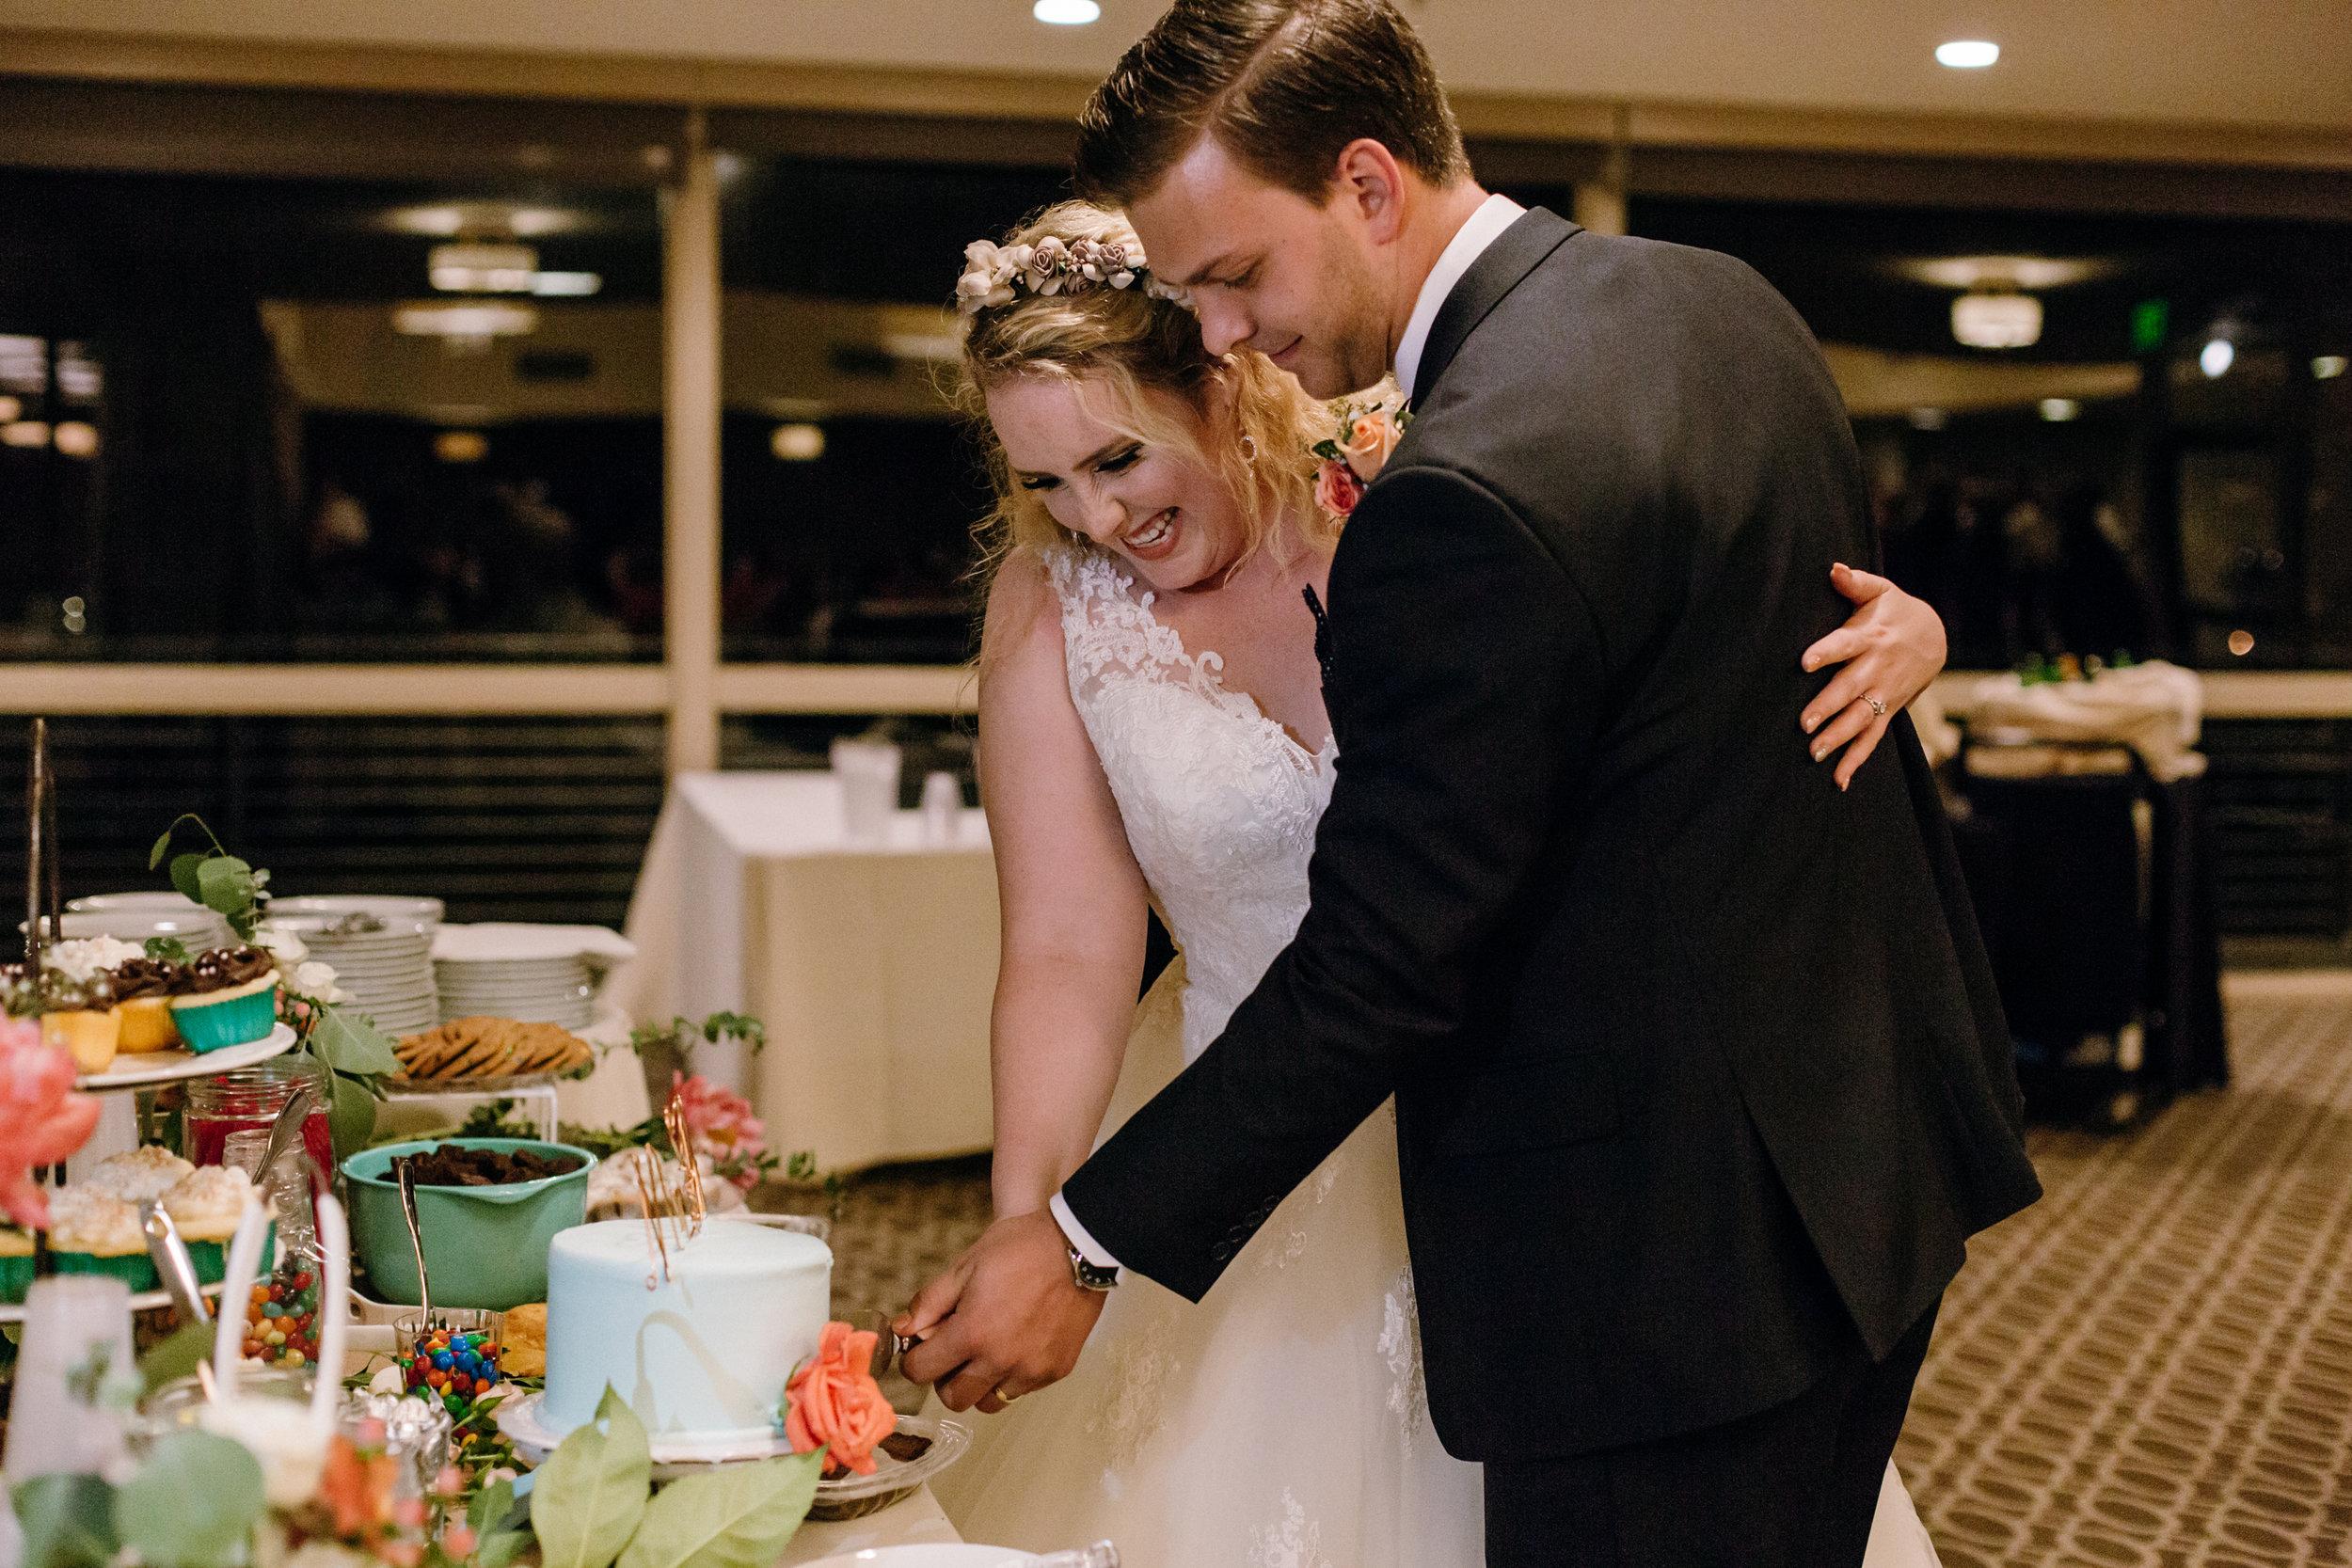 KaraNixonWeddings-PalosVerdes-Wedding-64.jpg